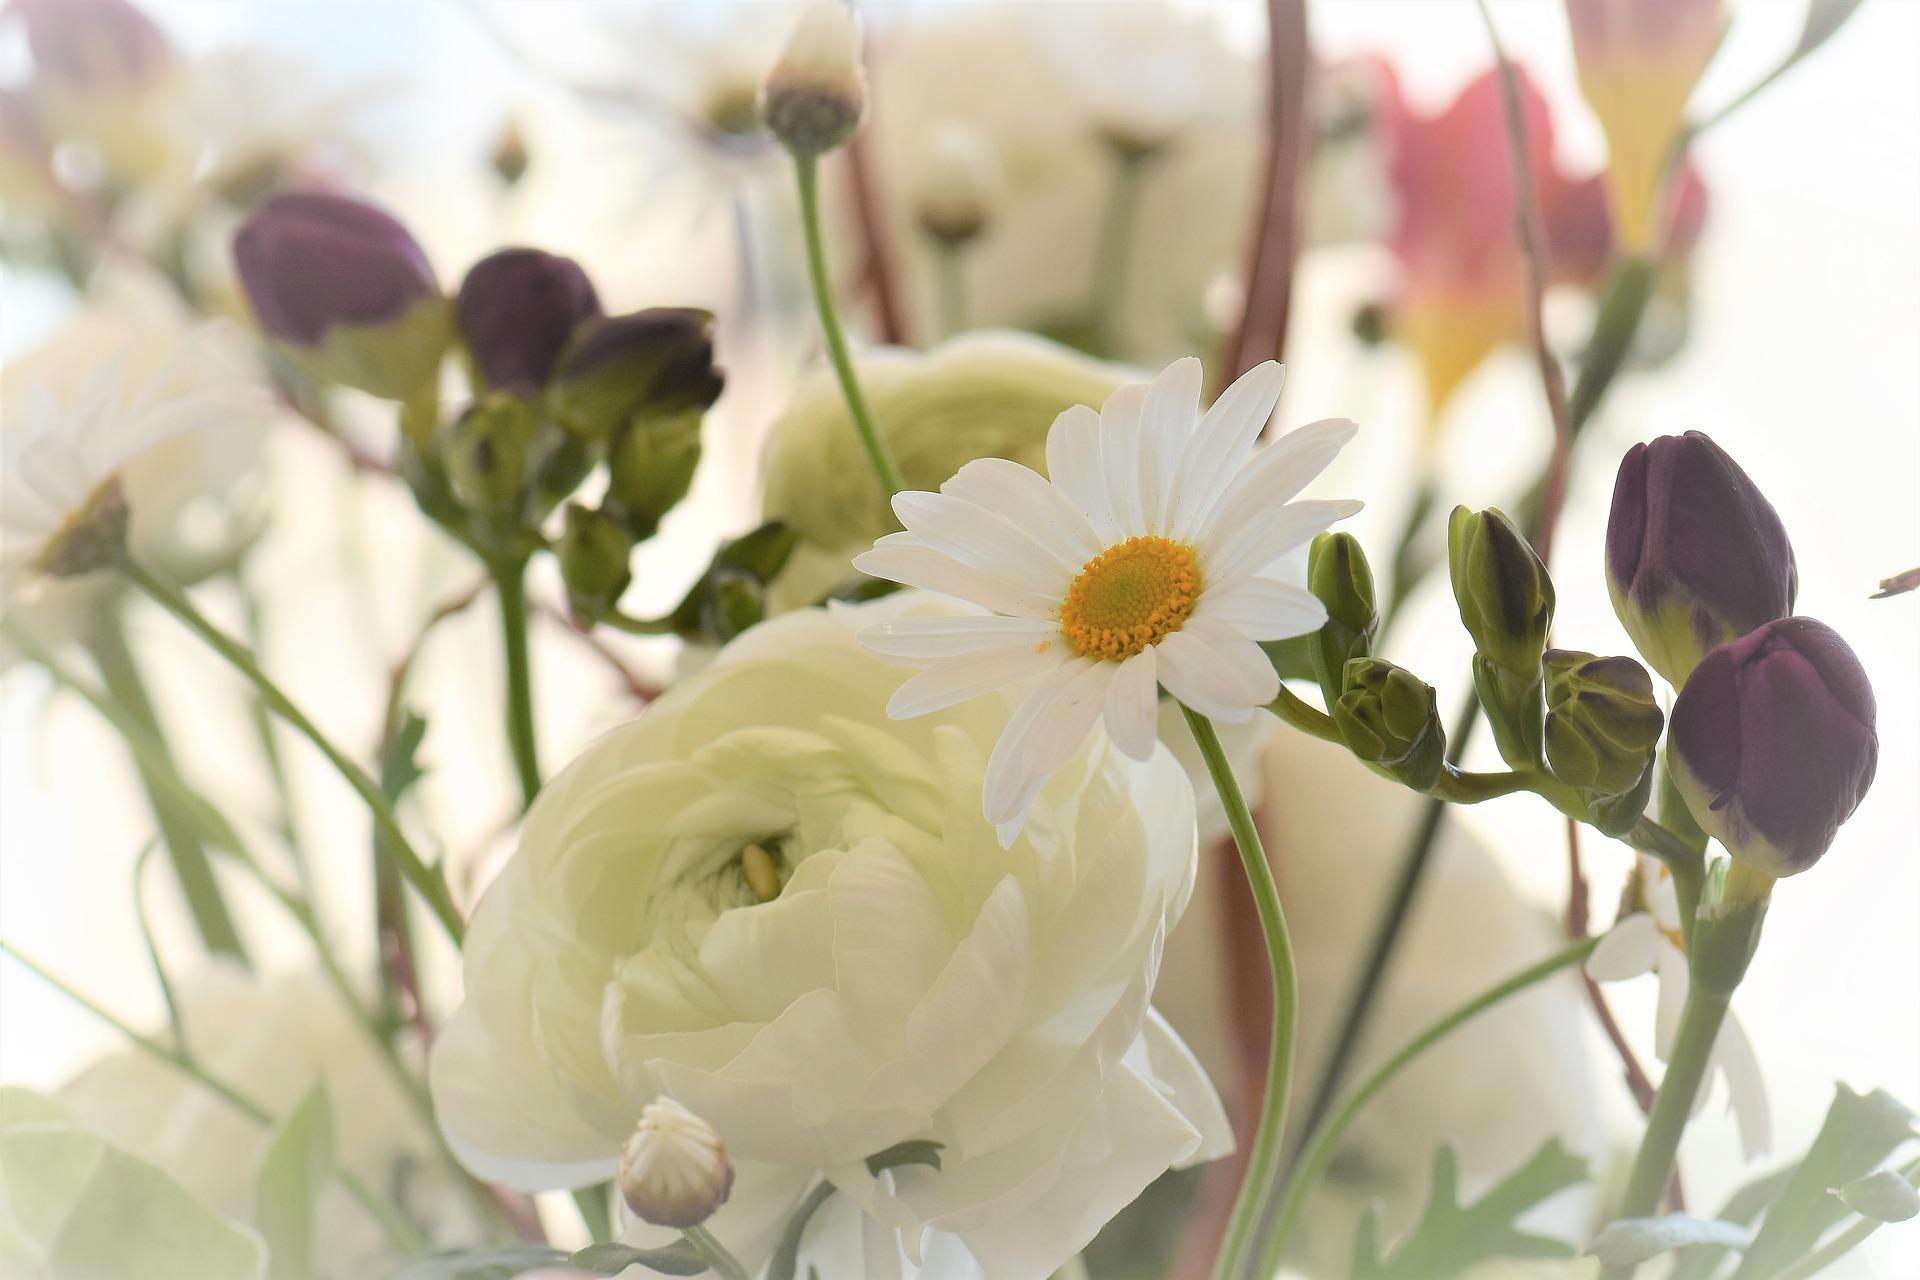 Flower blossom 2117952 1920